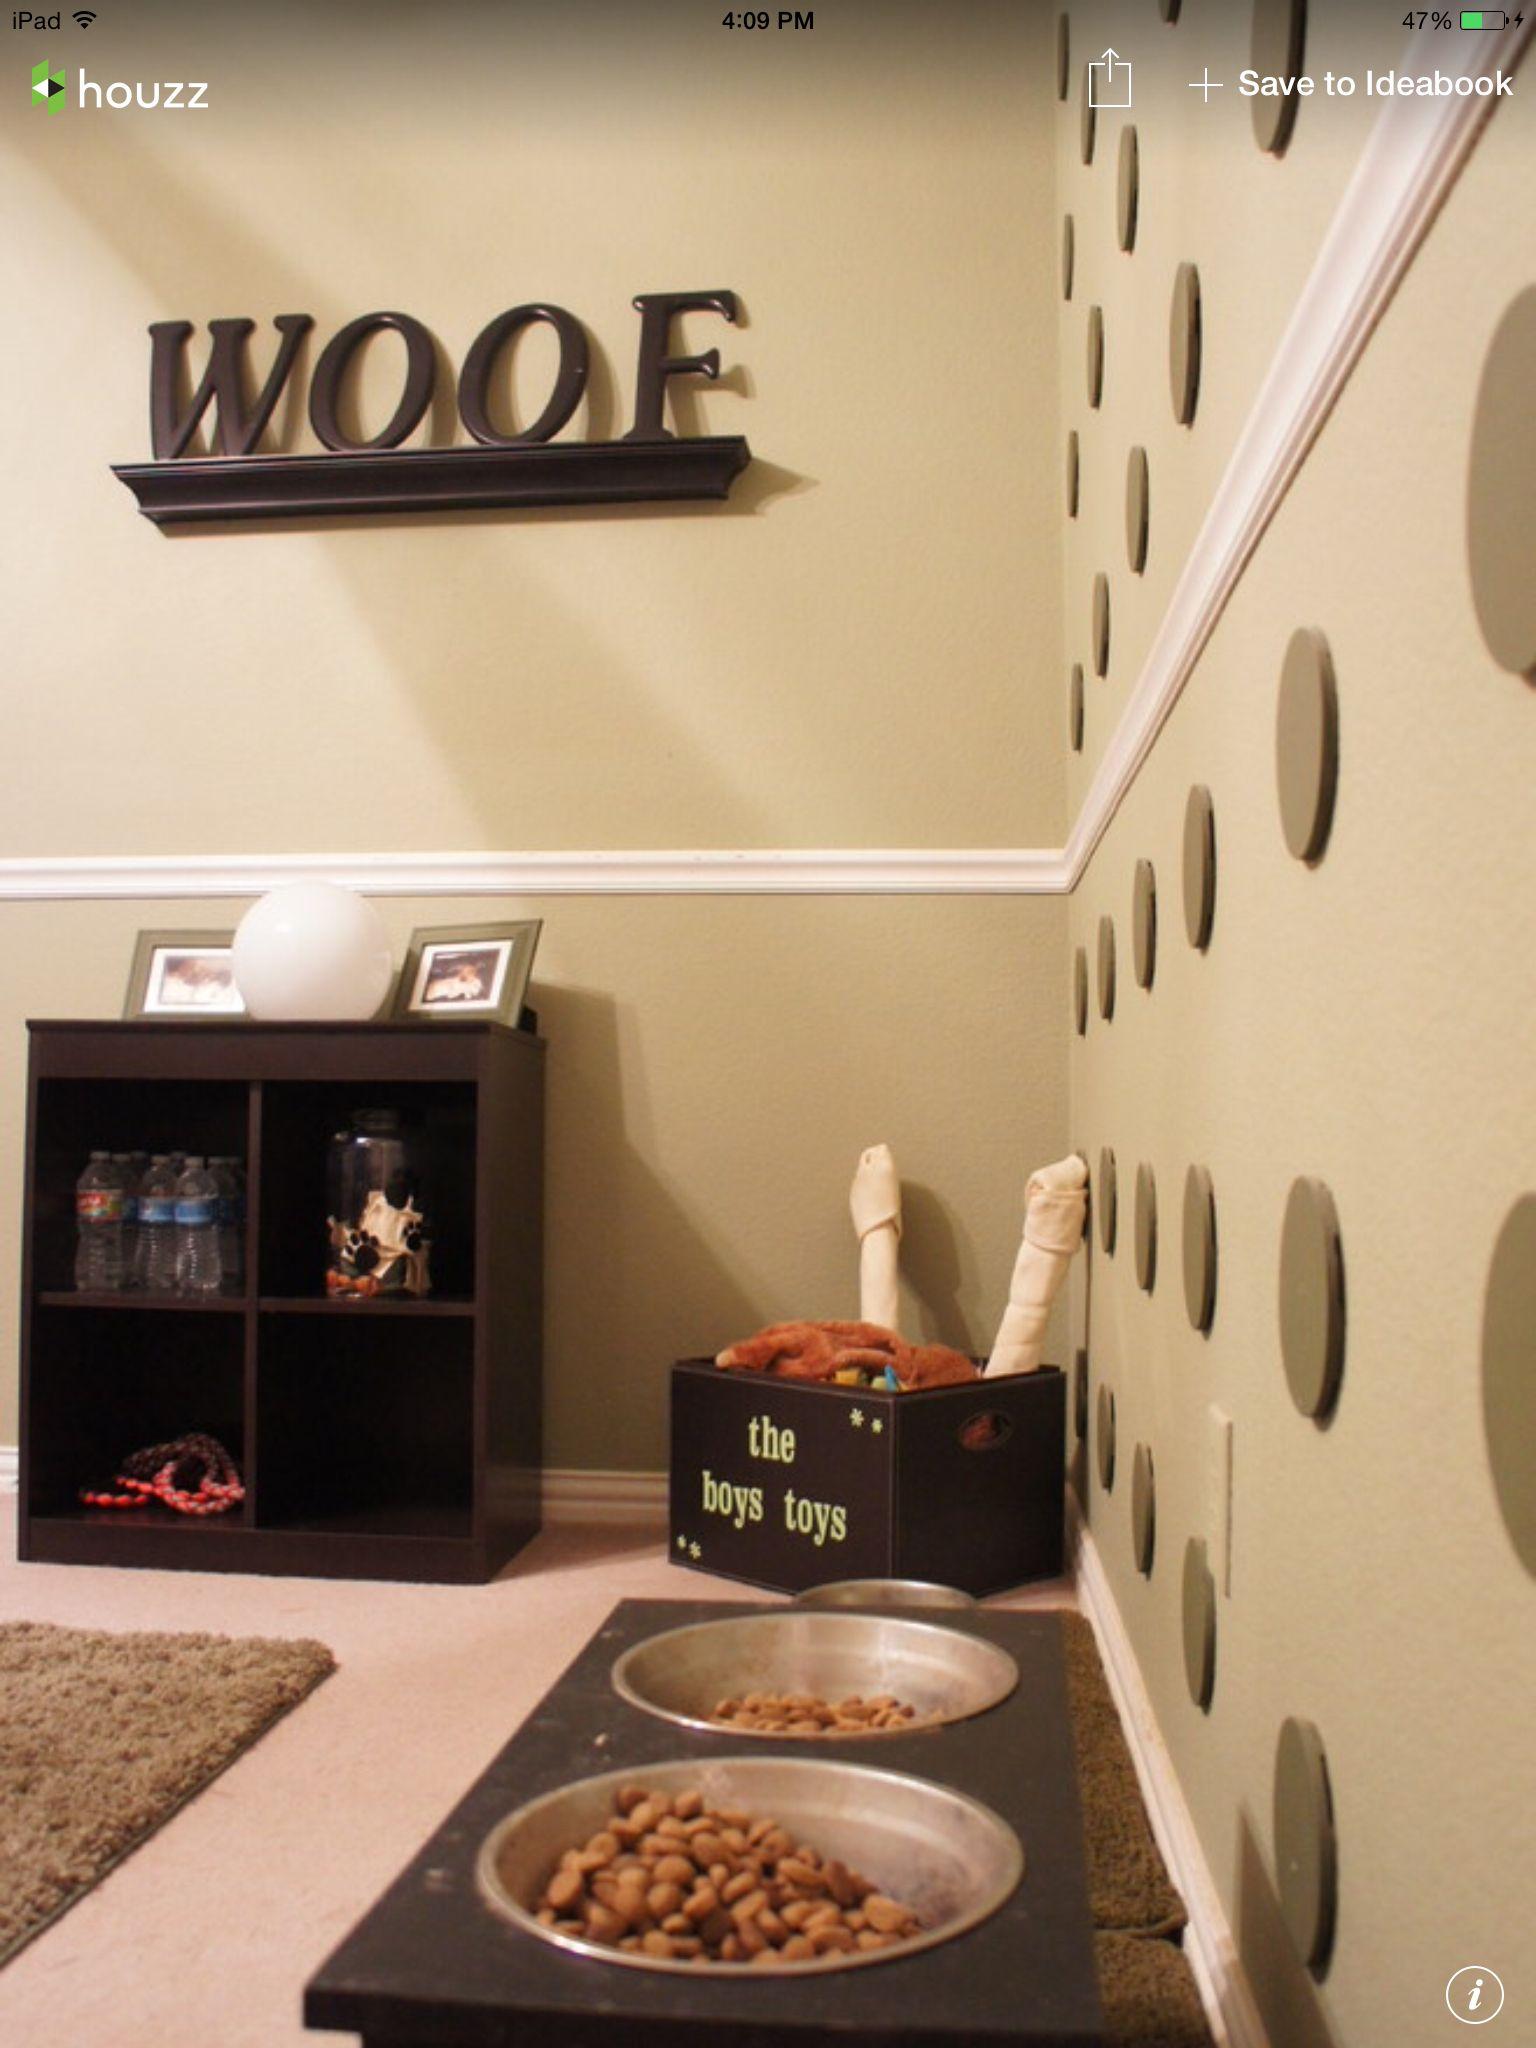 Doggy room ideas | Doggy Style | Pinterest | Doggy stuff, Dog and ...